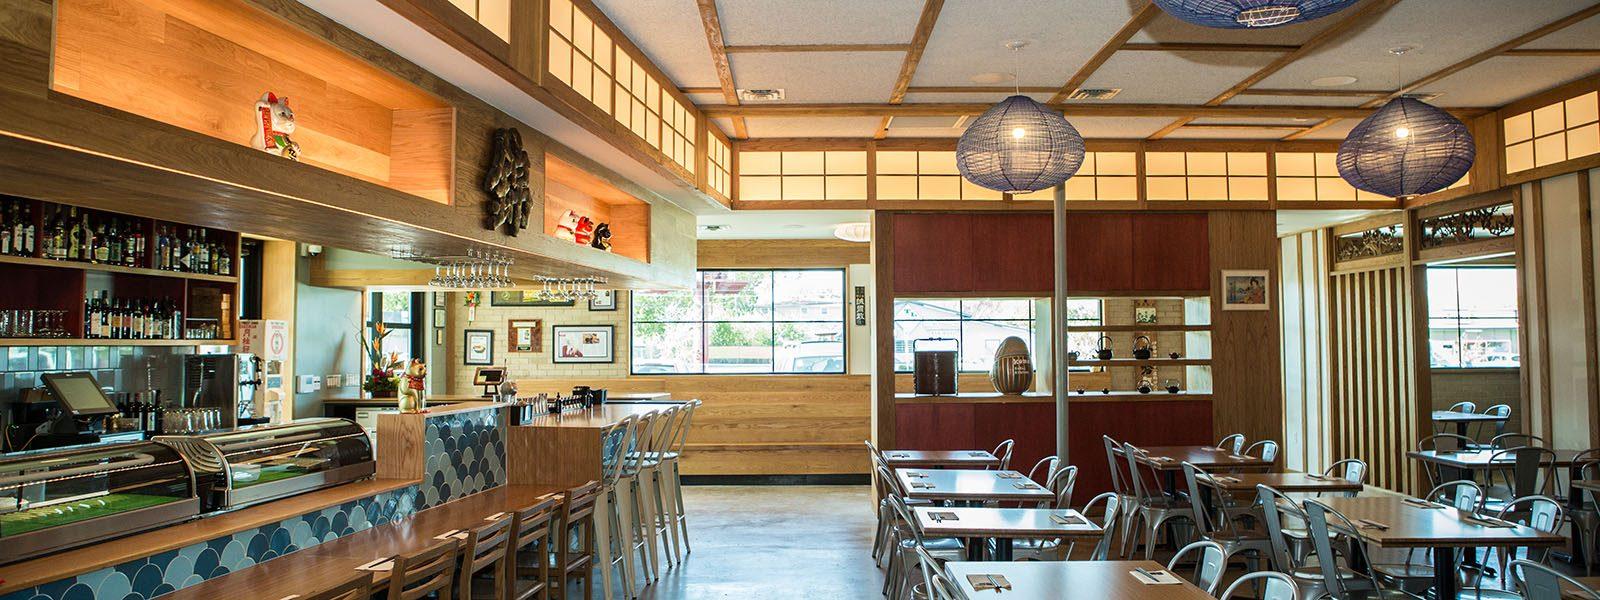 Dining Room of Japanese restaurant, Kome, in Austin, Texas